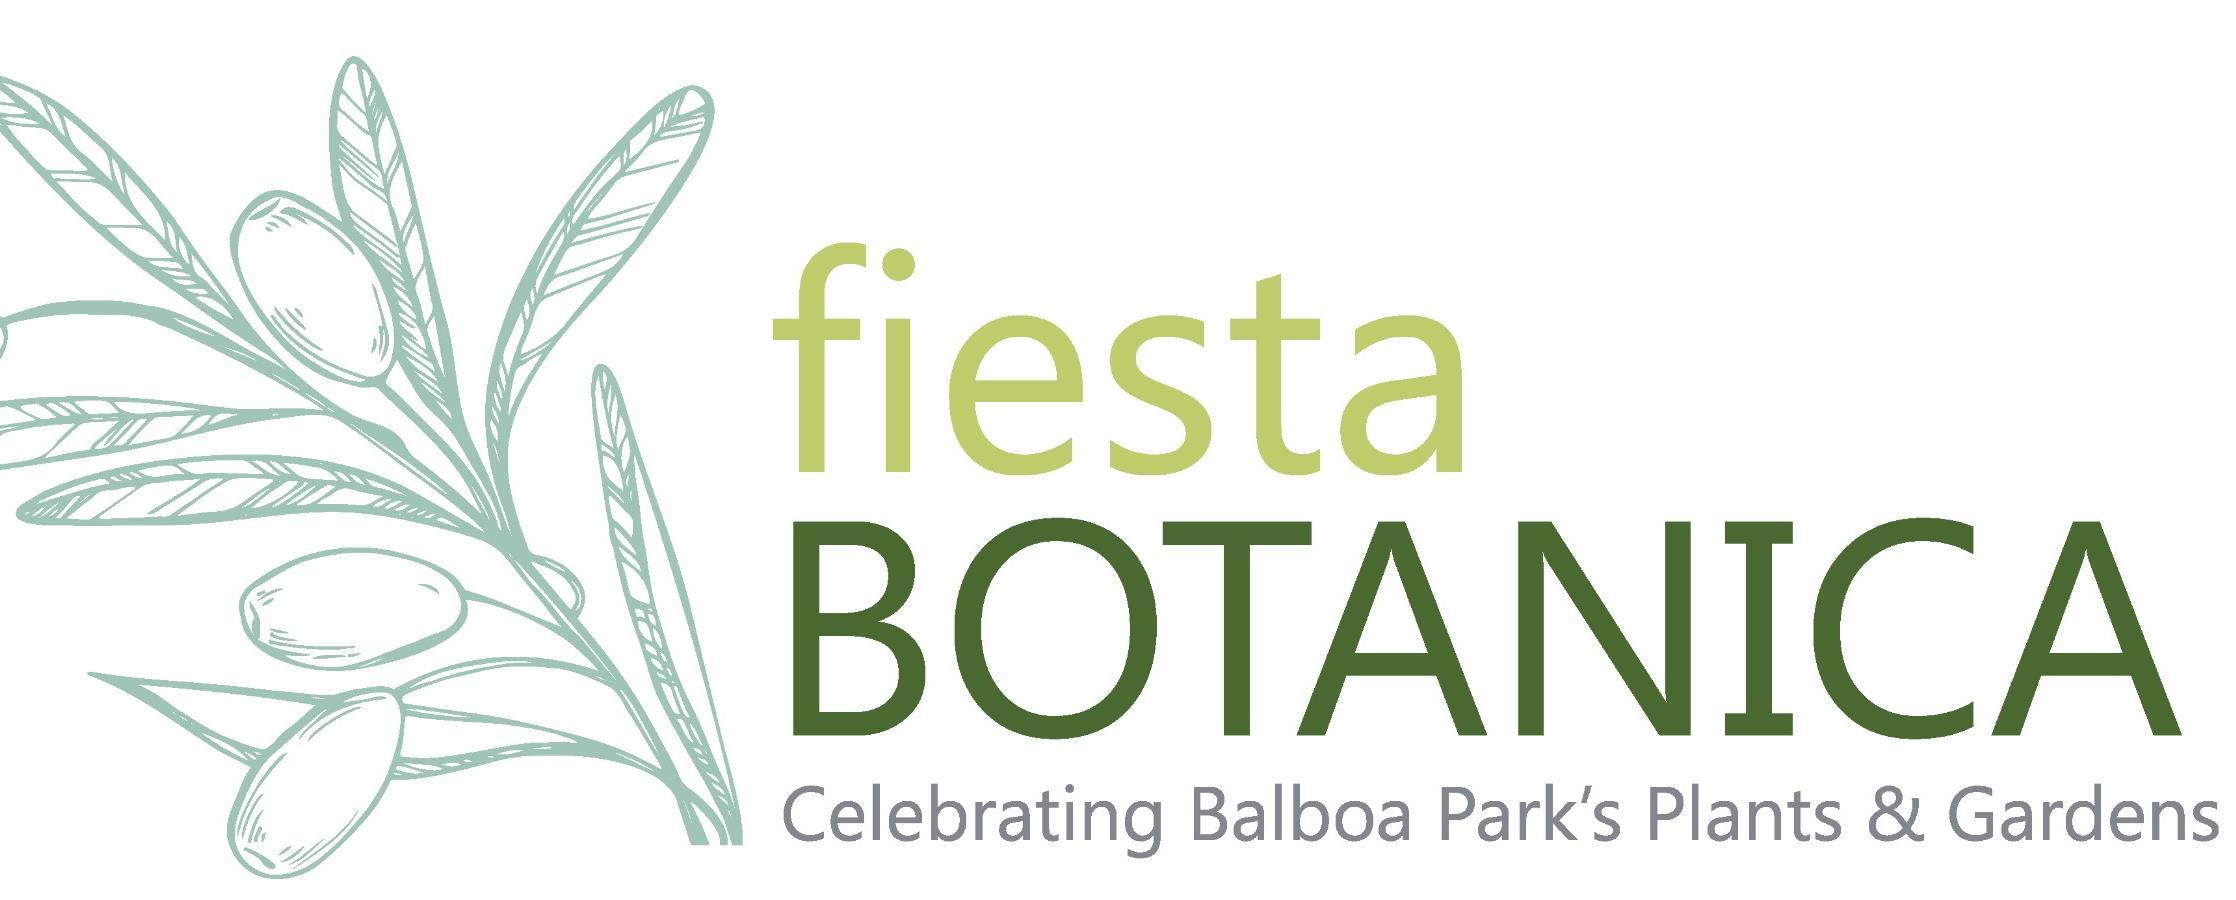 Fiesta Botanica